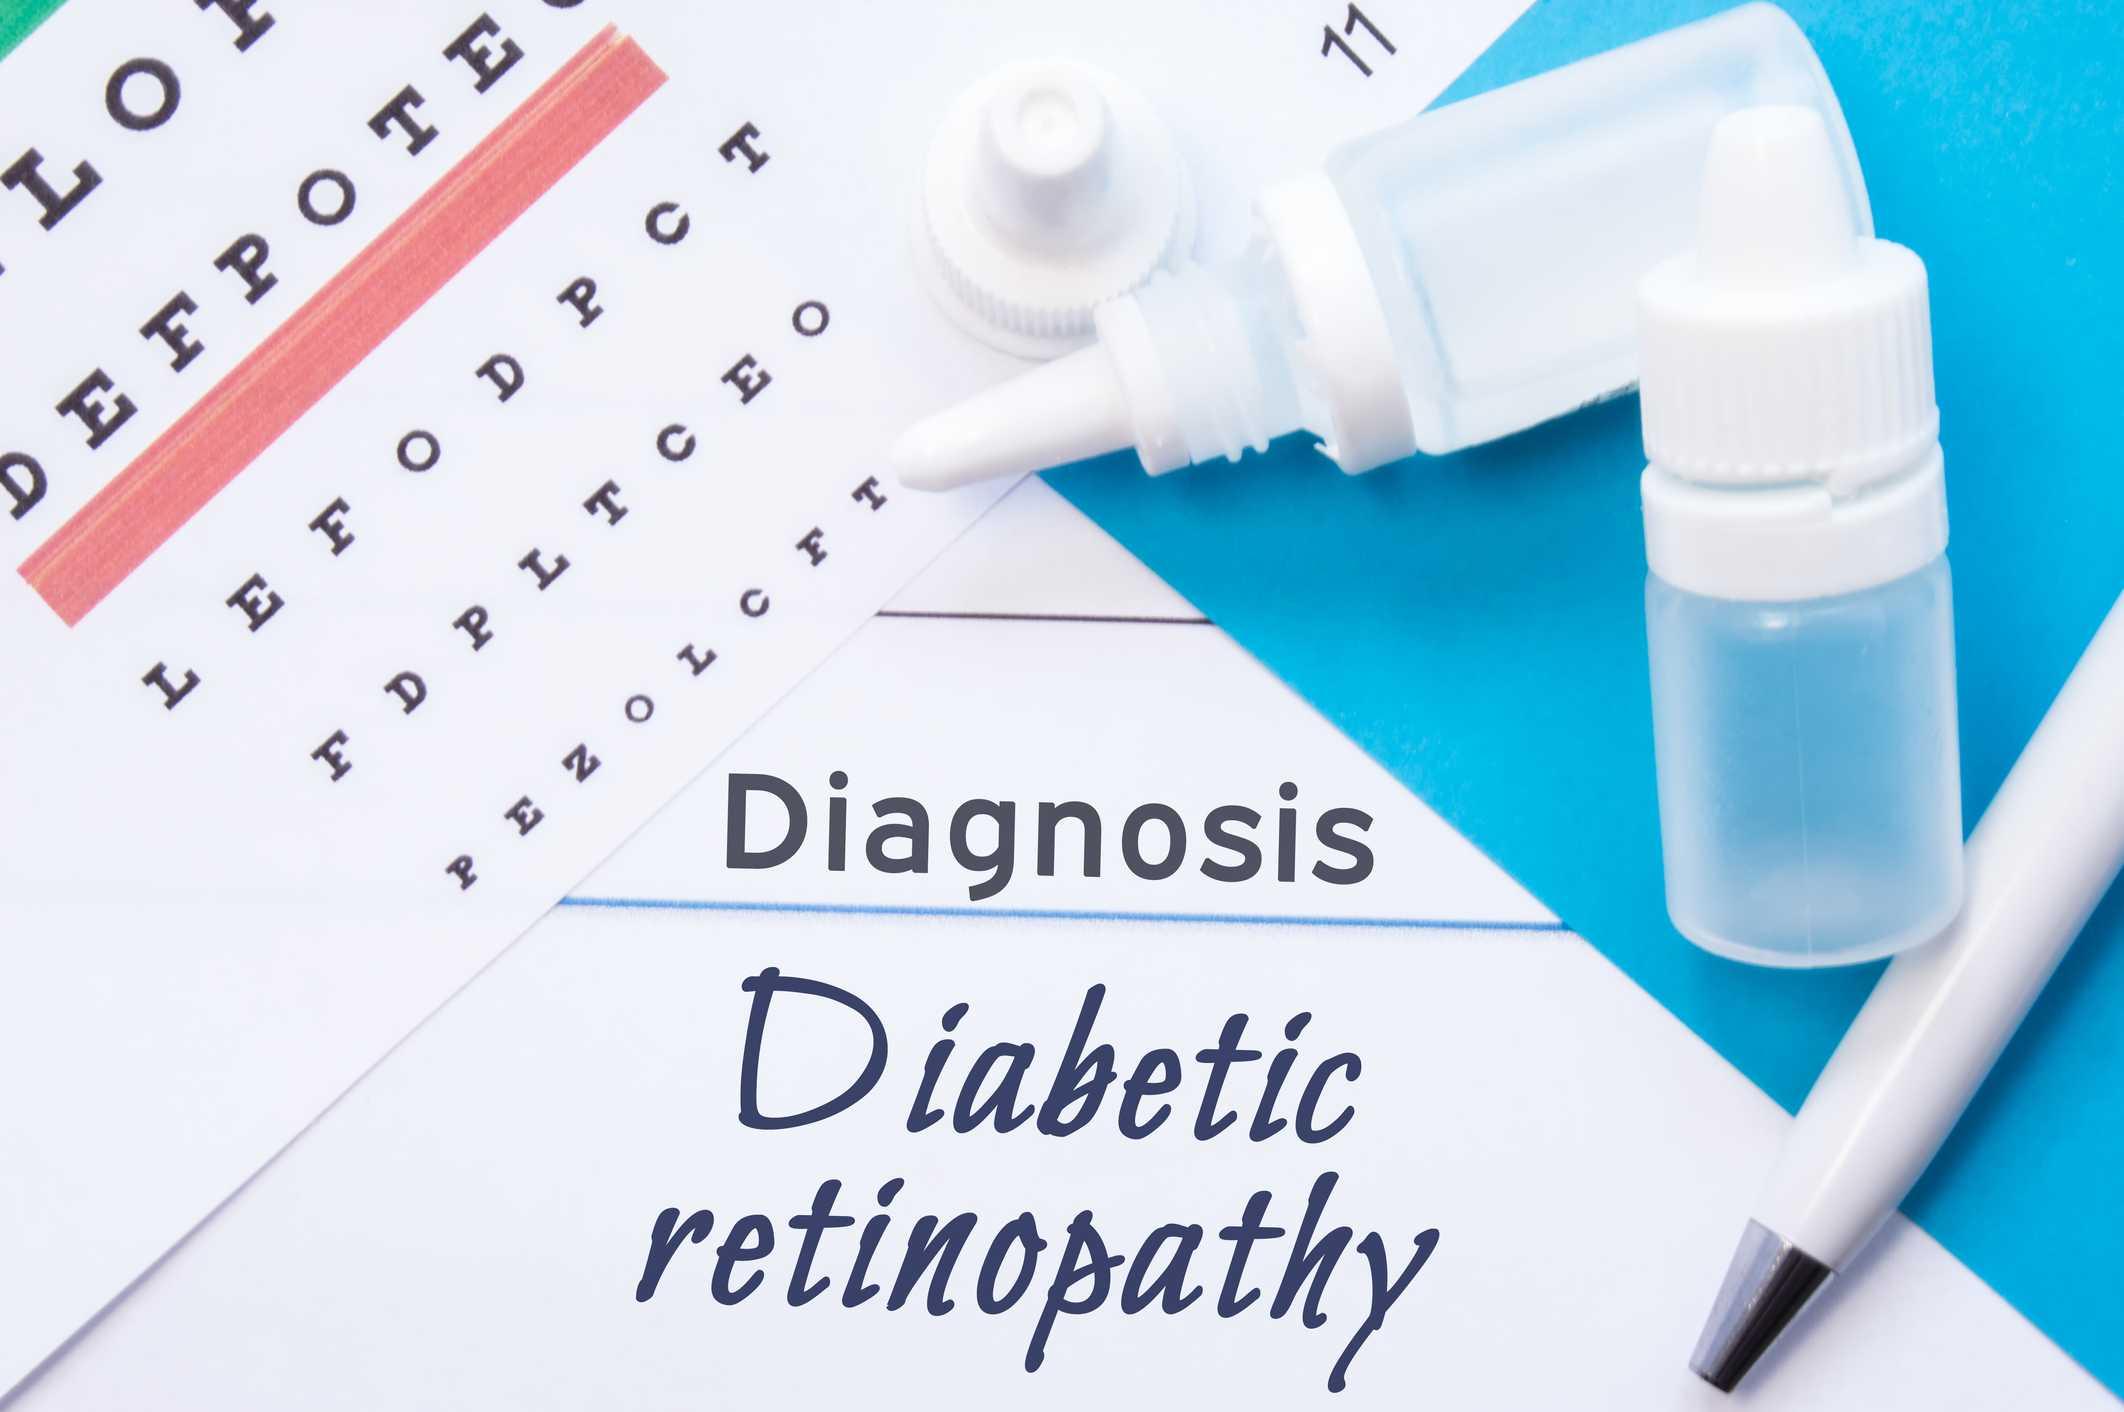 Diabetic Retinopathy Screening and Tests